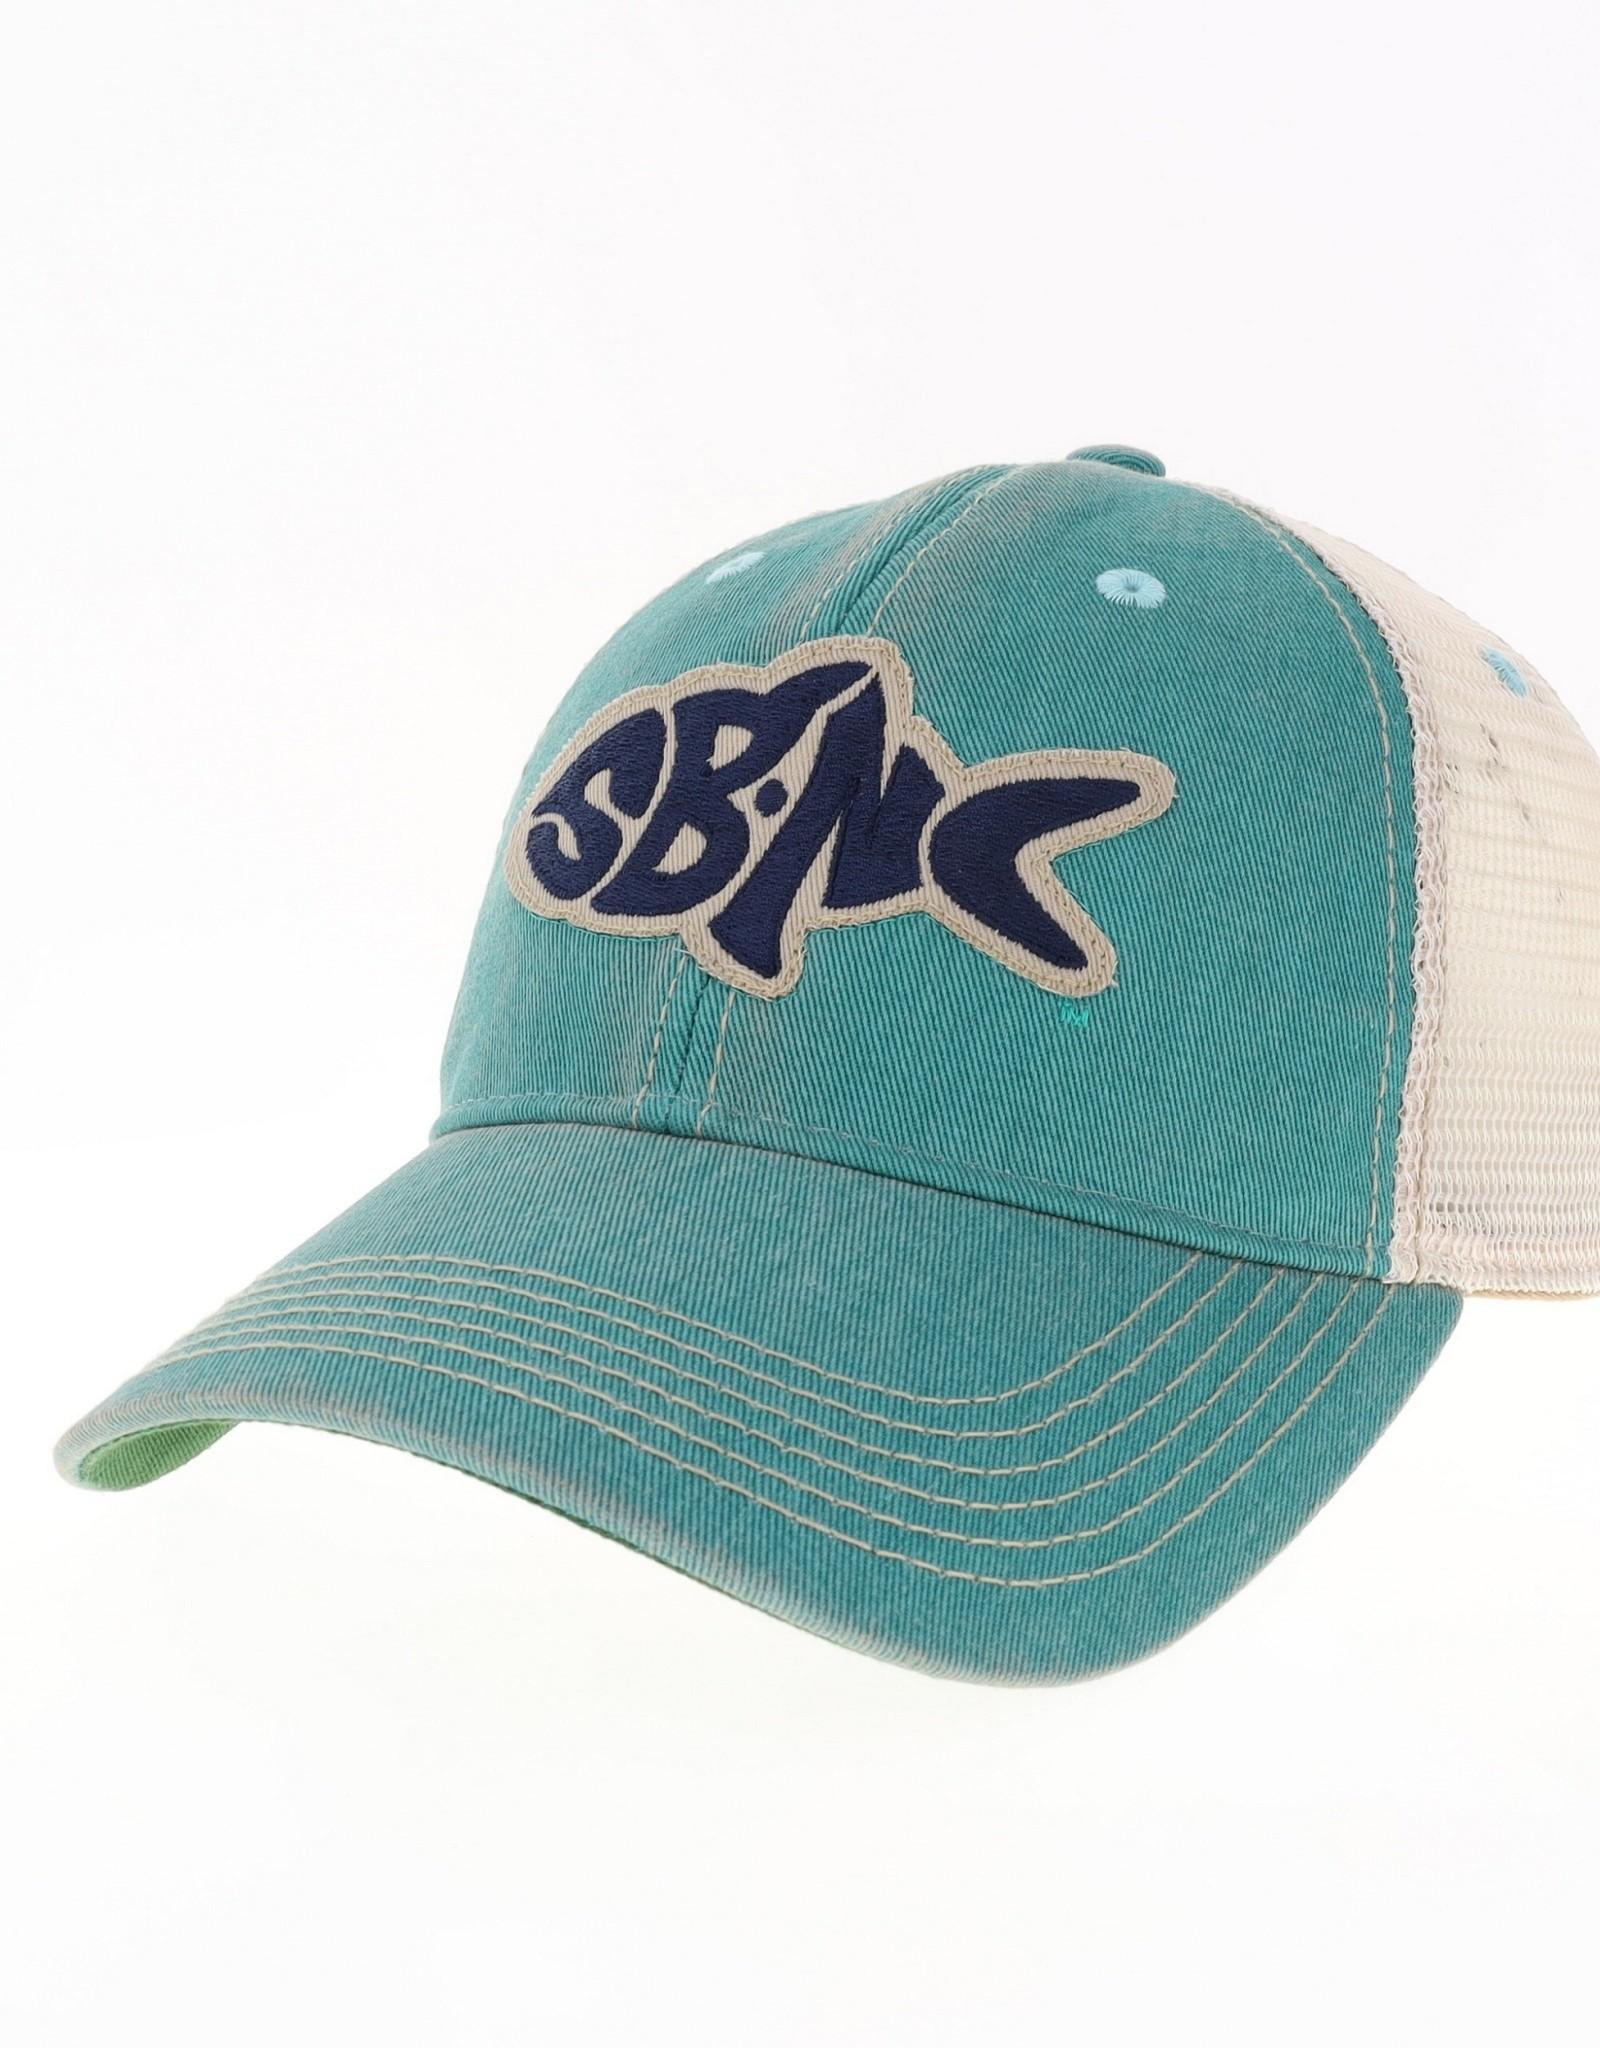 sbncfish SBNC FISH OFA TRUCKER CAP AQUA